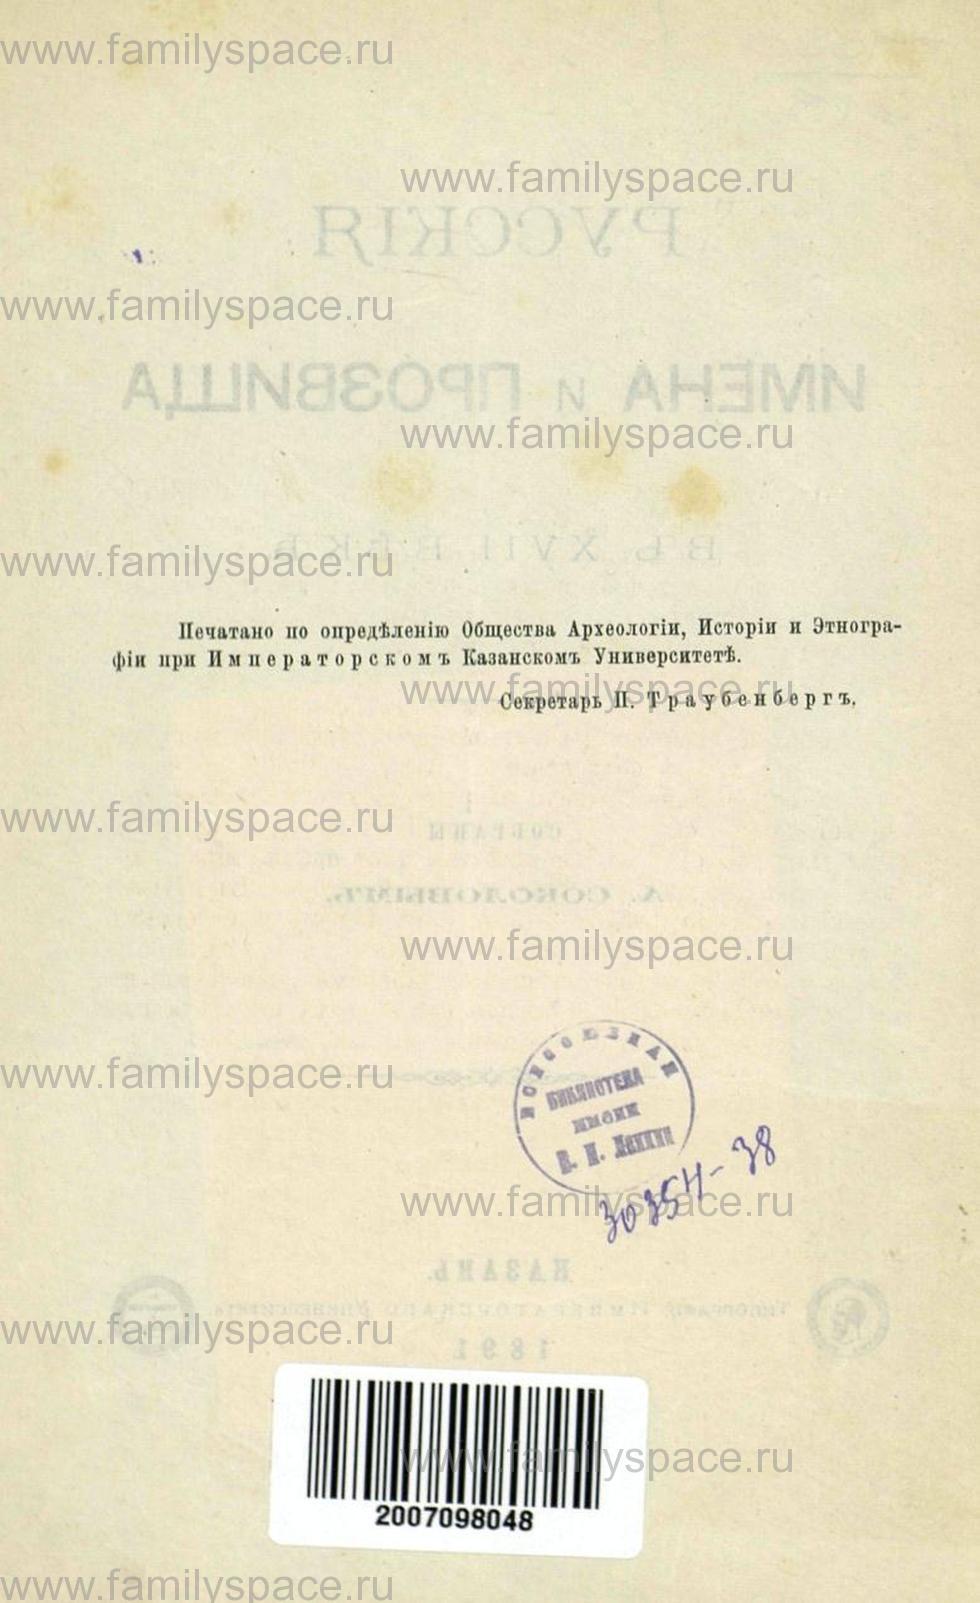 Поиск по фамилии - Русские имена и прозвища в 17 веке, страница 3